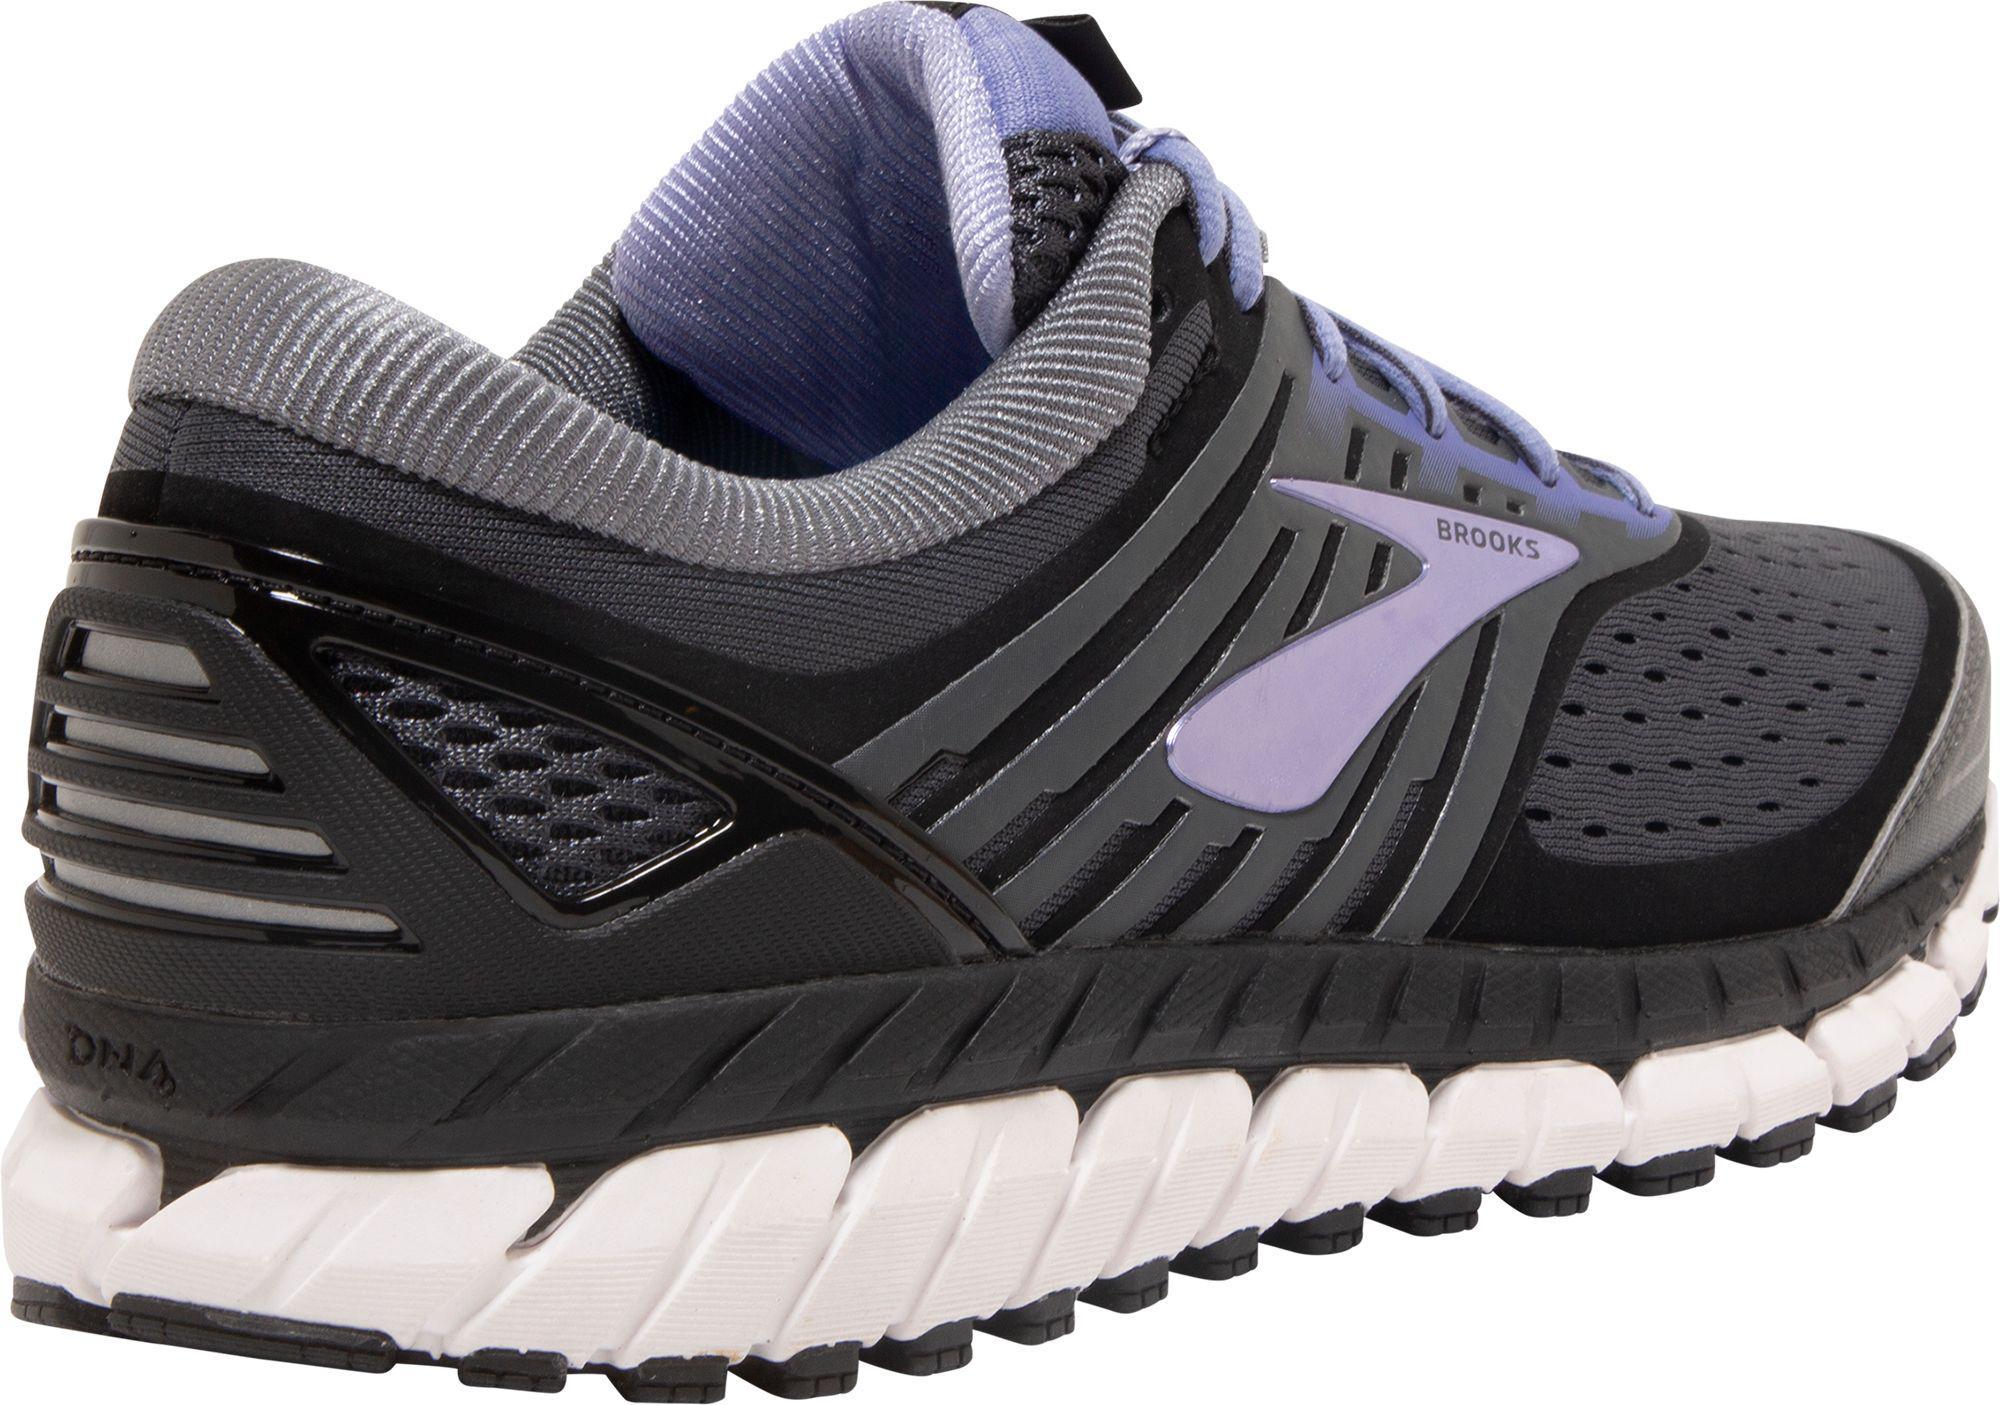 brand new b48aa ca4a5 Lyst - Brooks Ariel 18 Running Shoes in Black